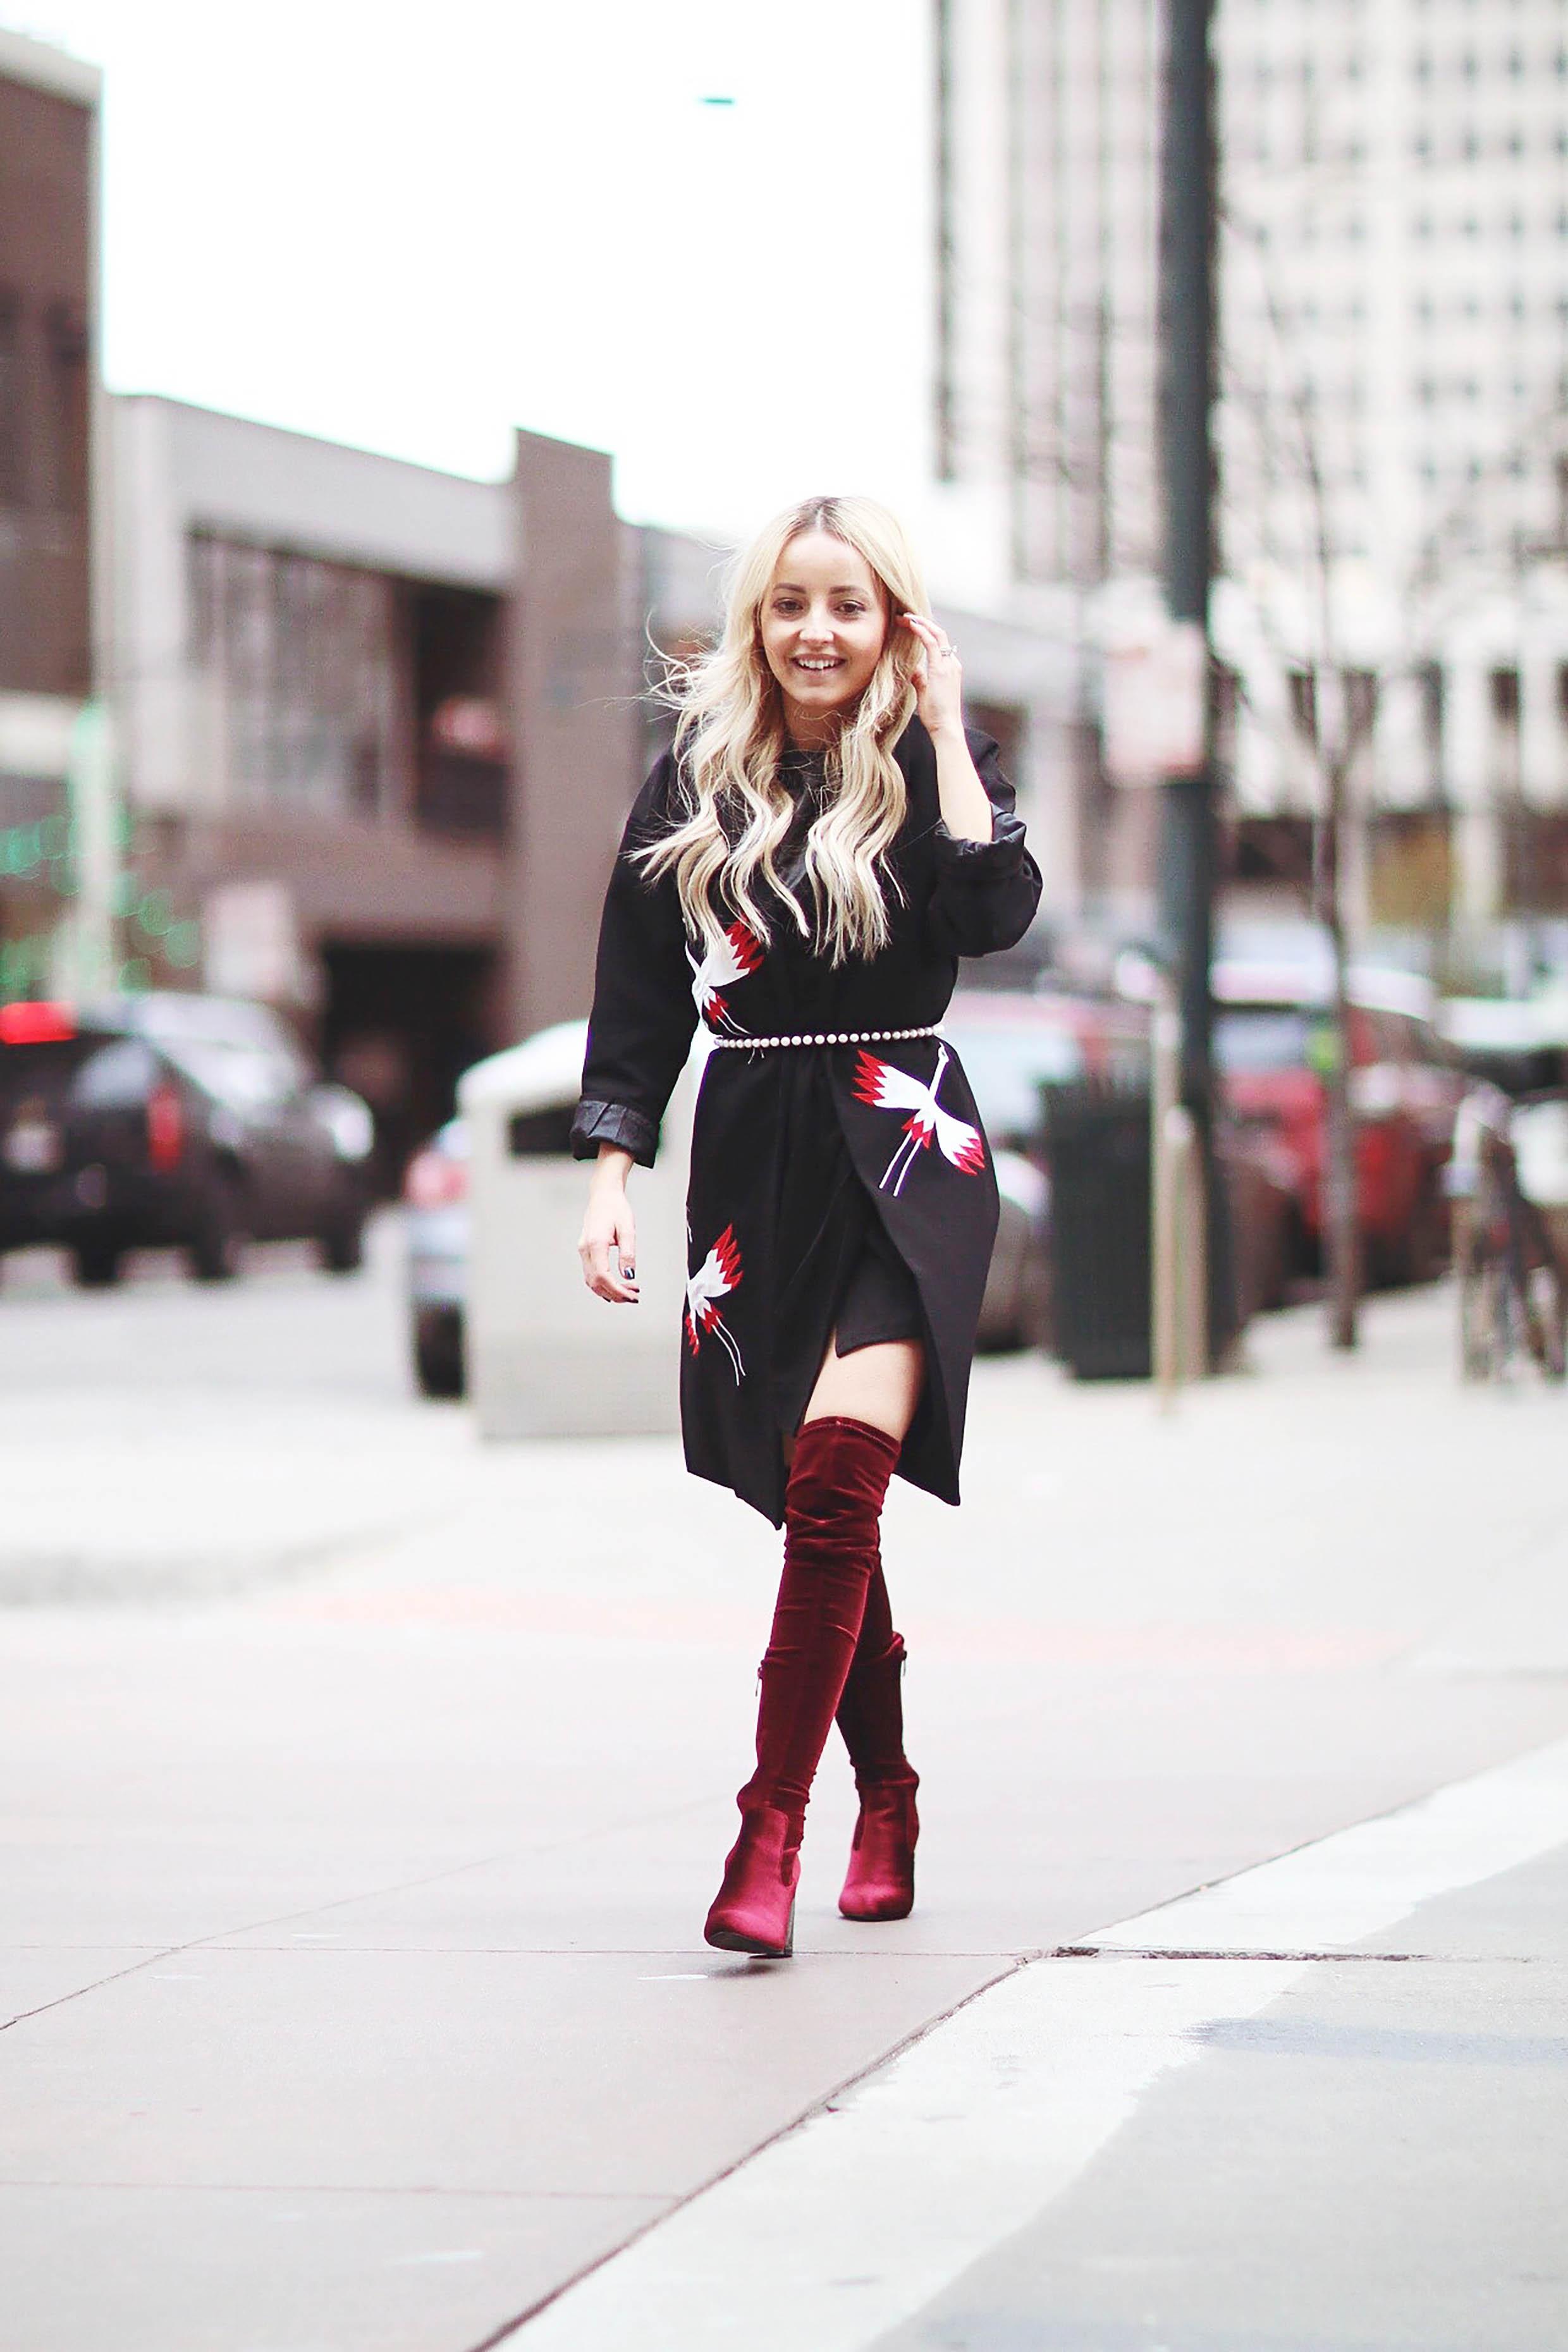 Alena Gidenko of modaprints.com talks about how to wear a coat as a dress